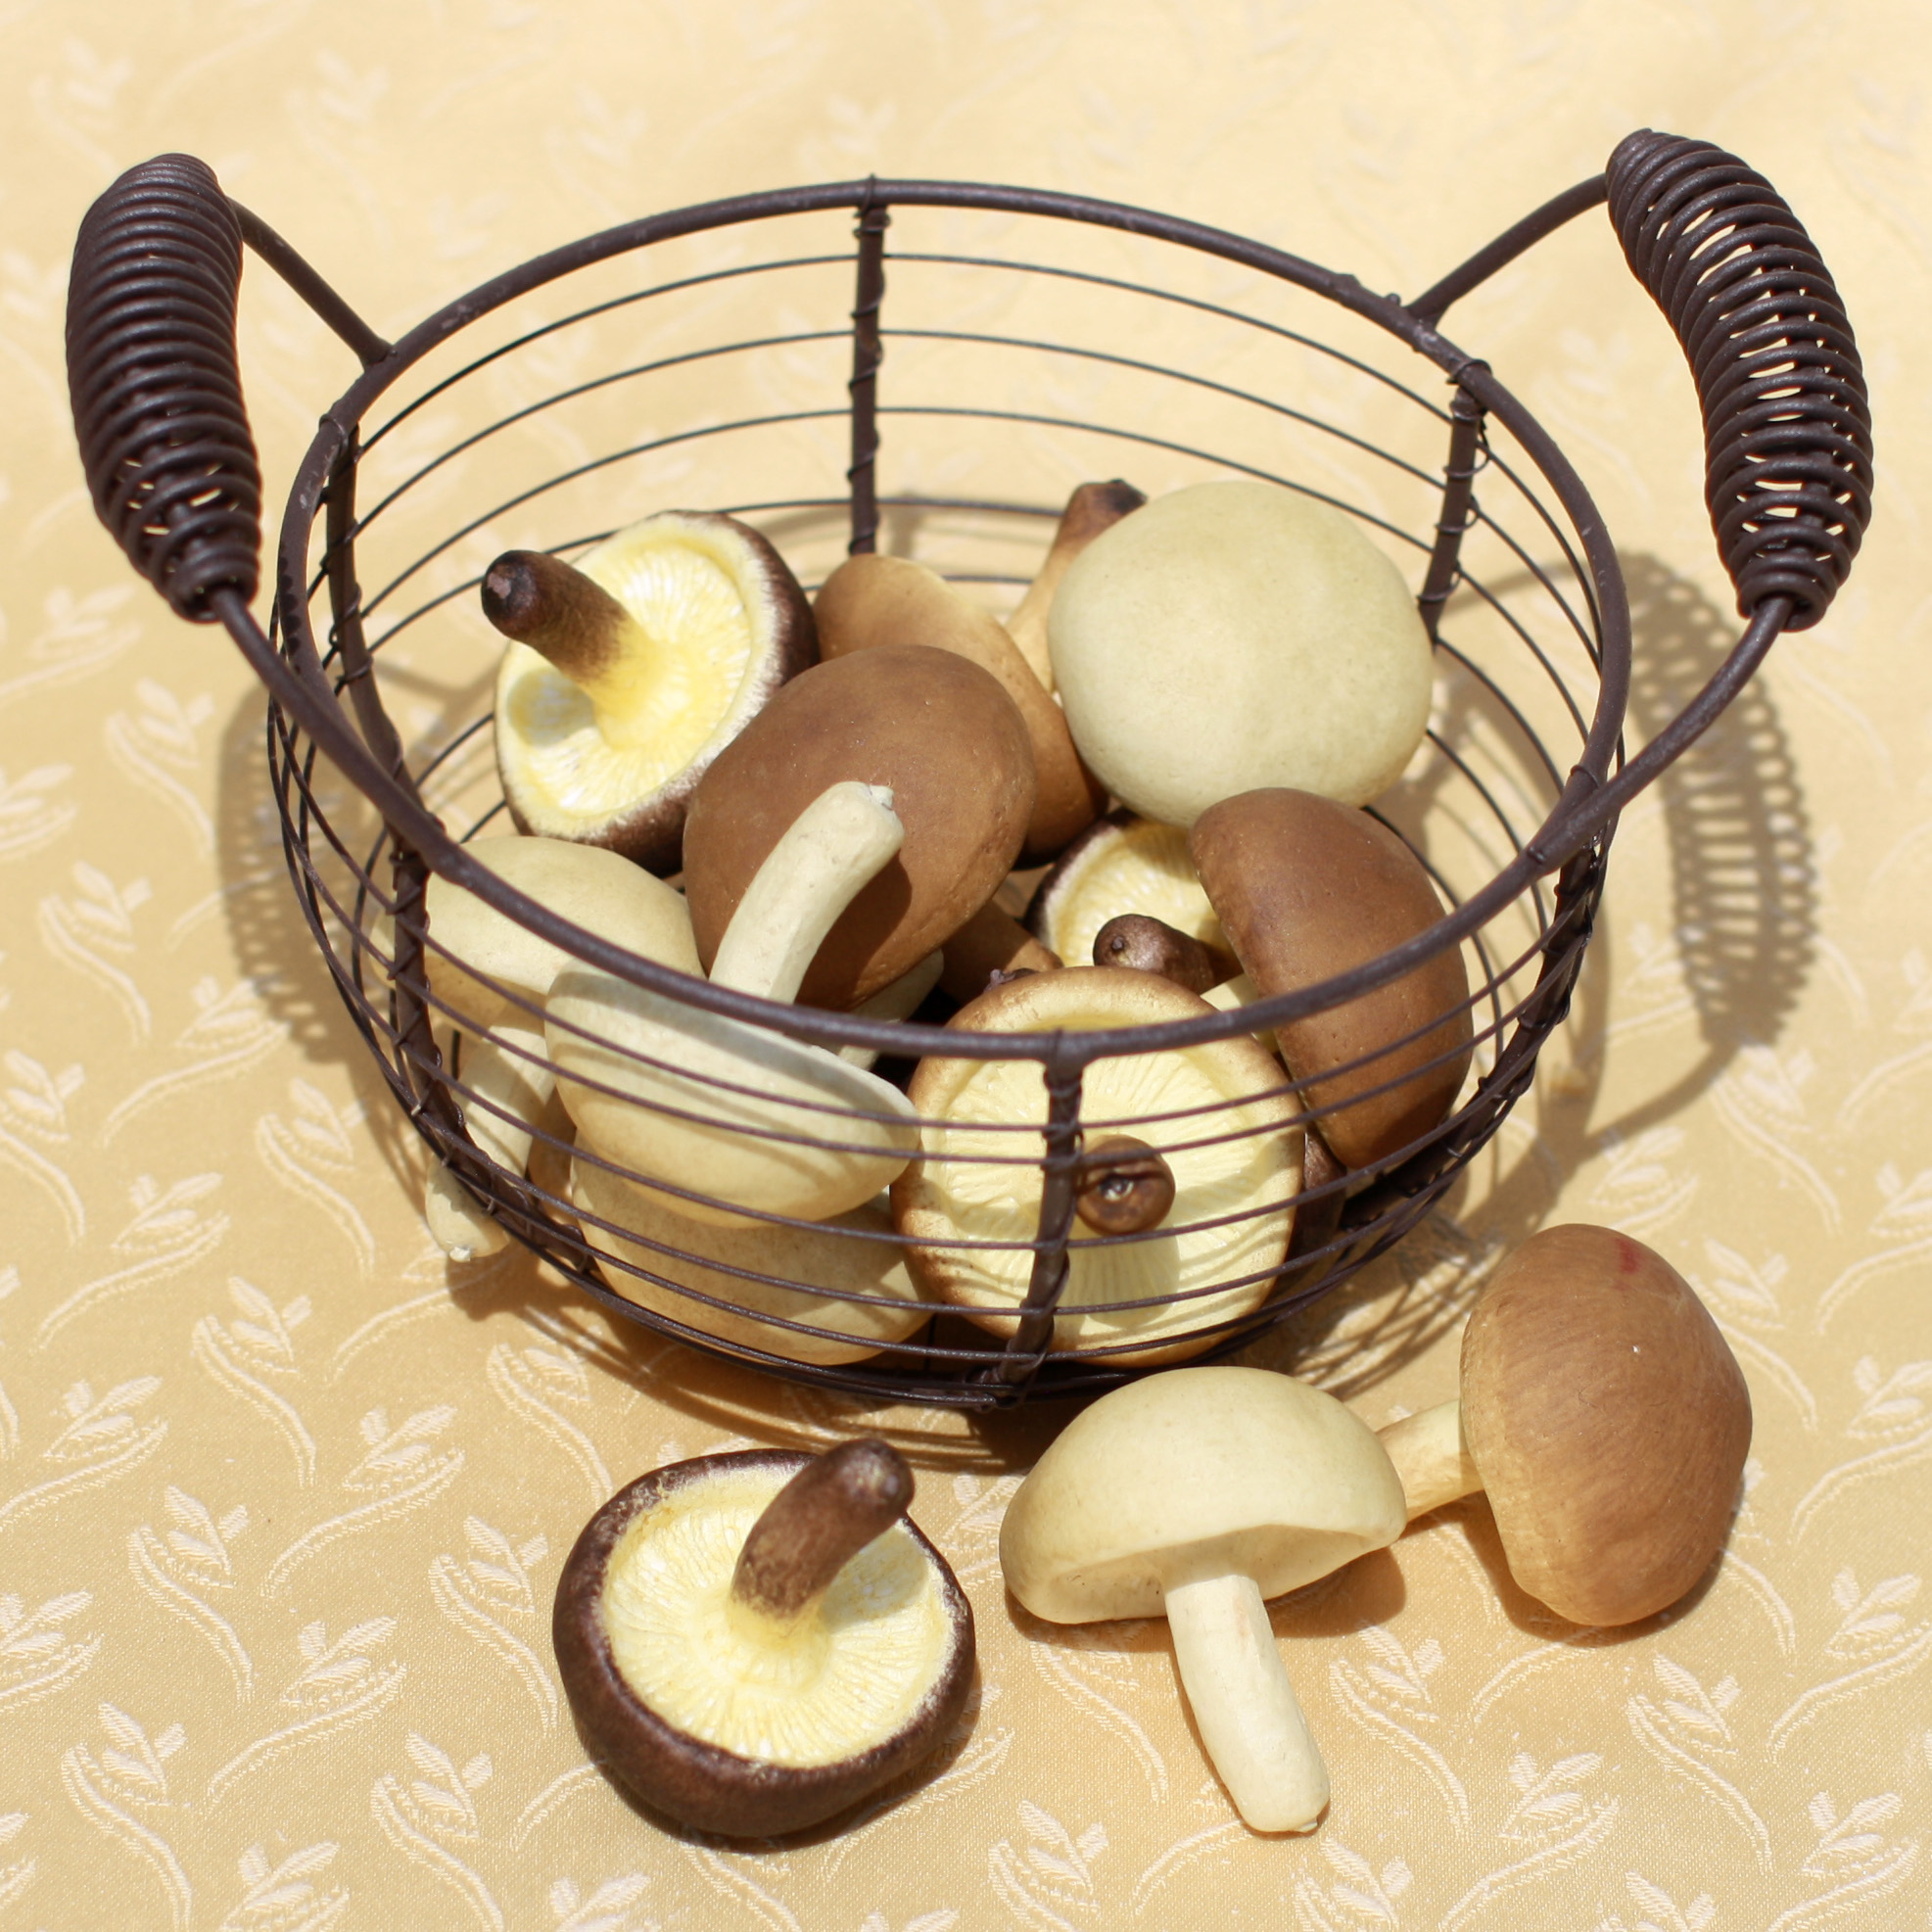 Artificial Mushrooms